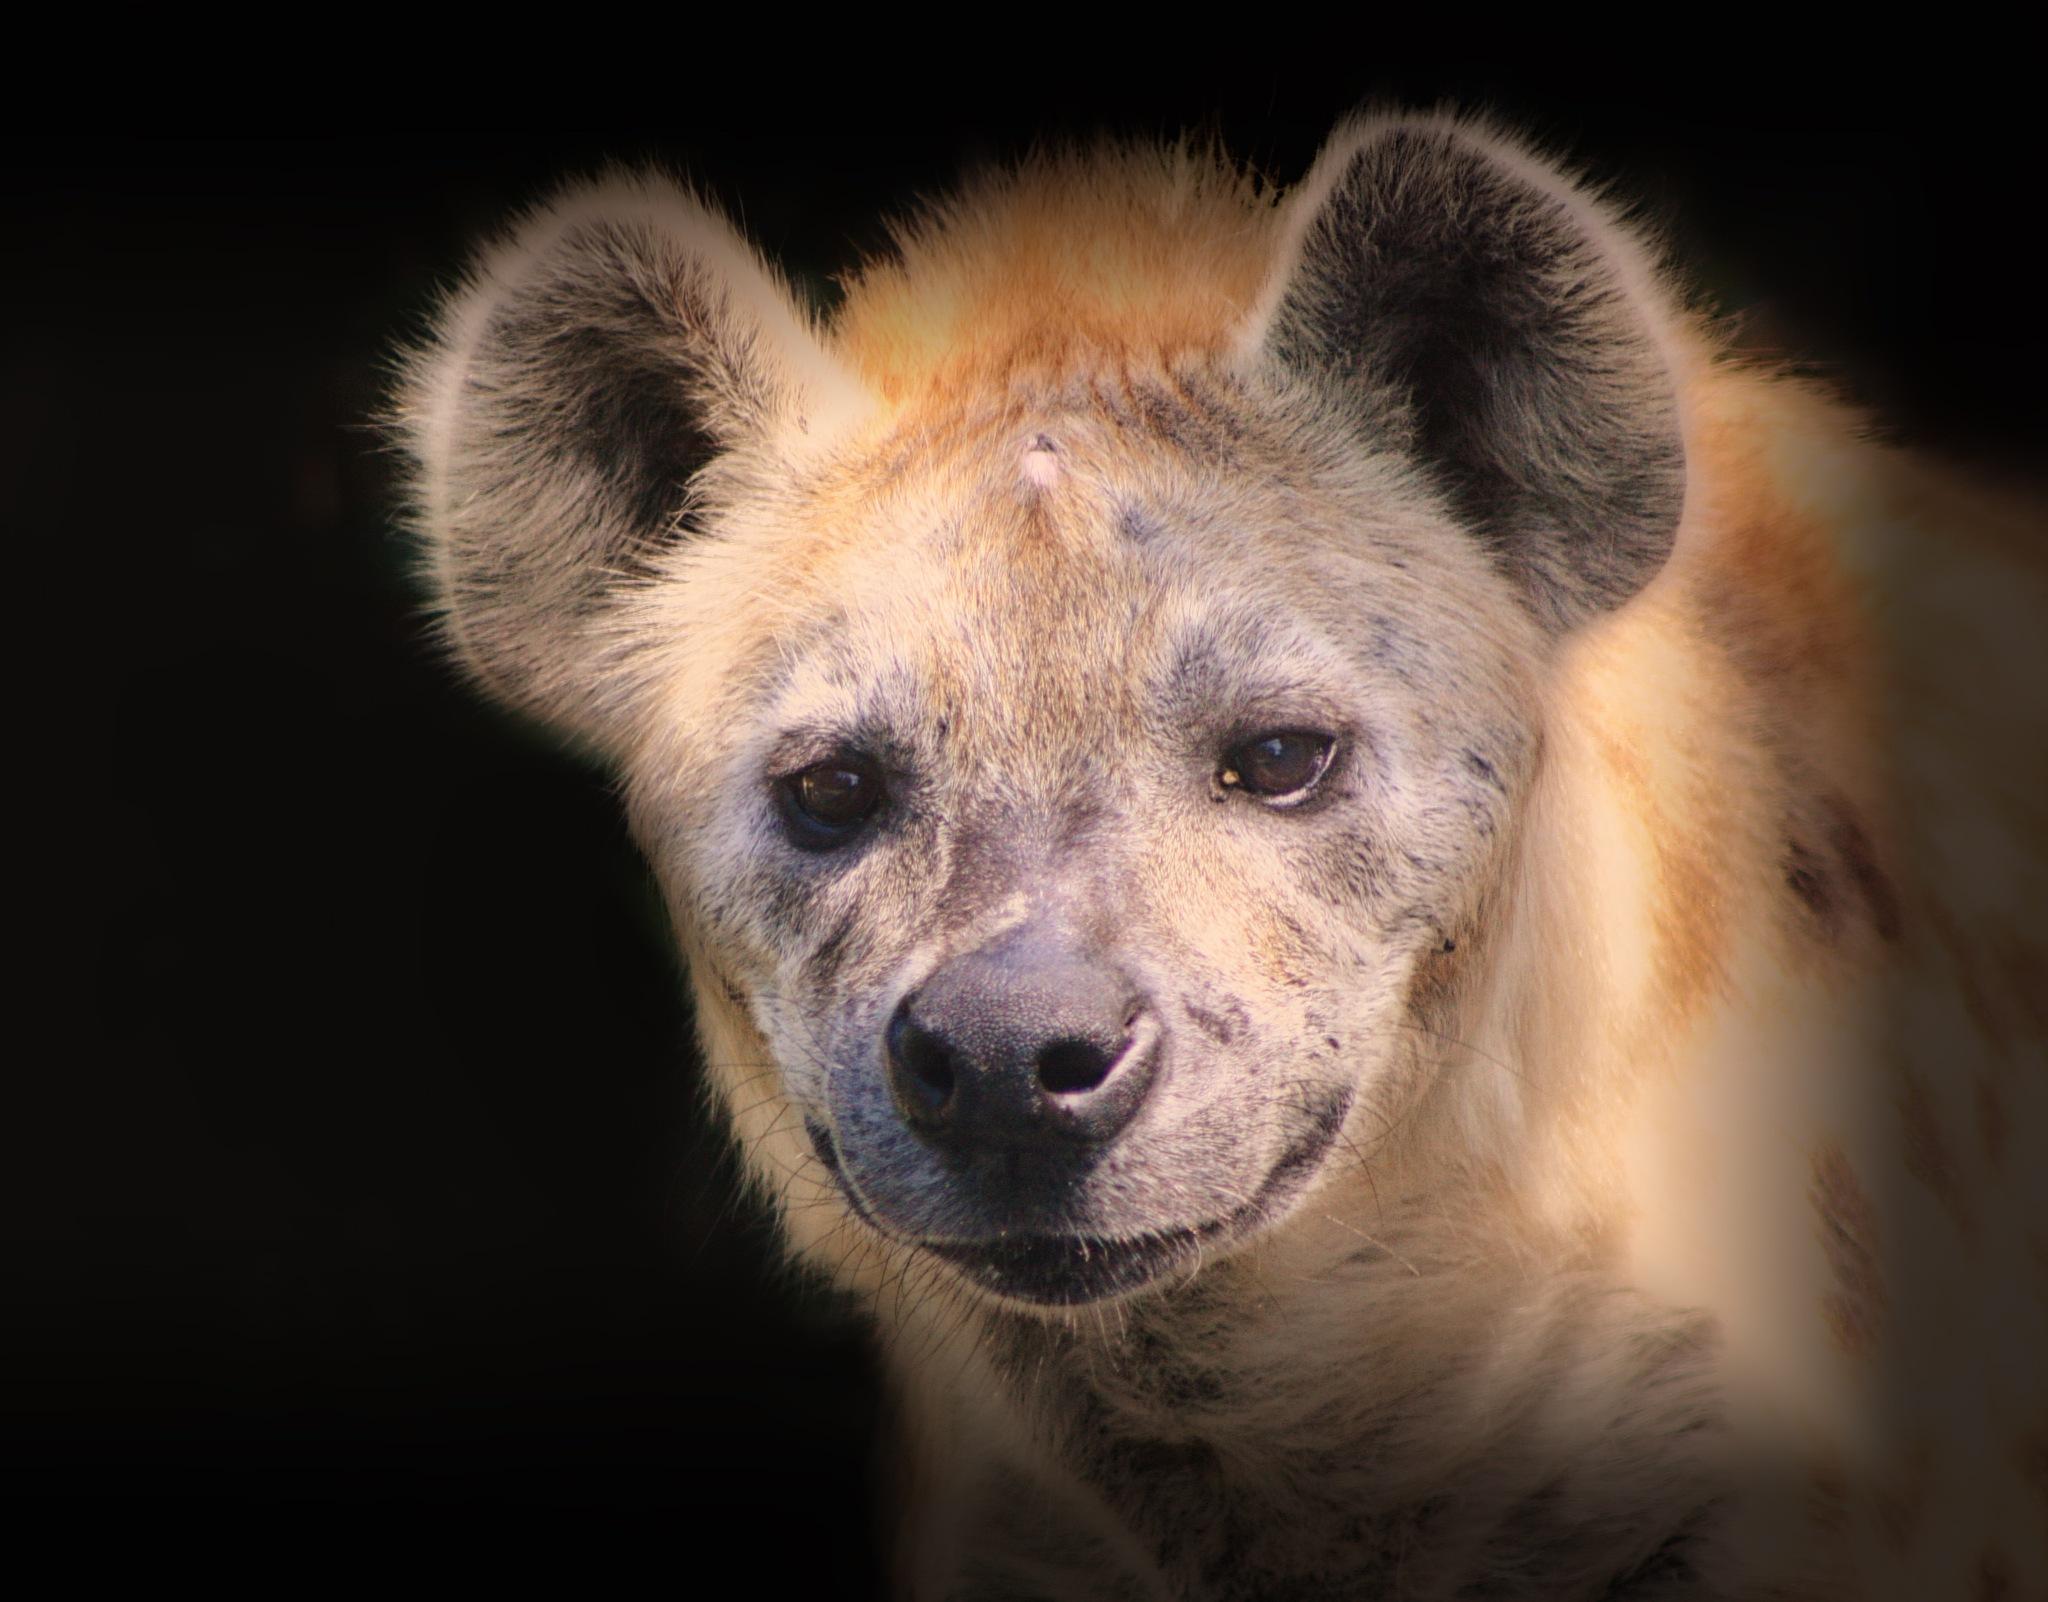 Hyena by Henrik T. Sørensen